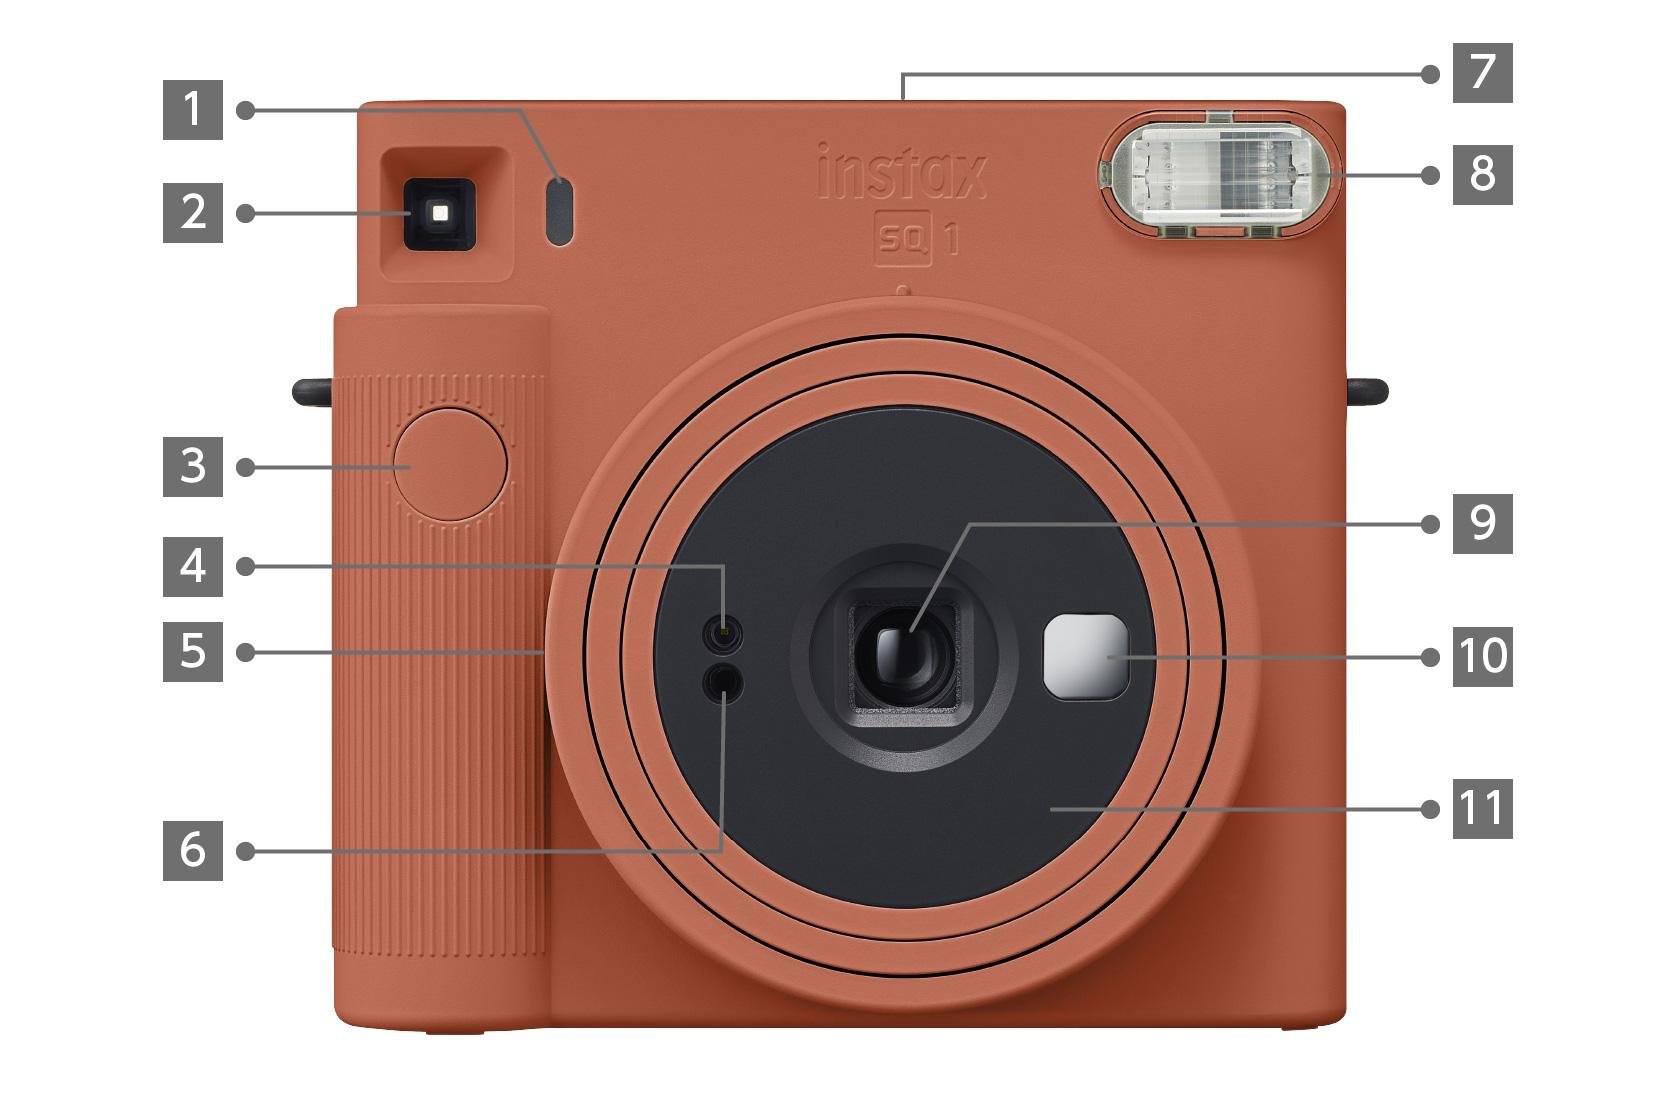 [photo] INSTAX SQUARE SQ1 camera in Terracotta Orange color, Front view